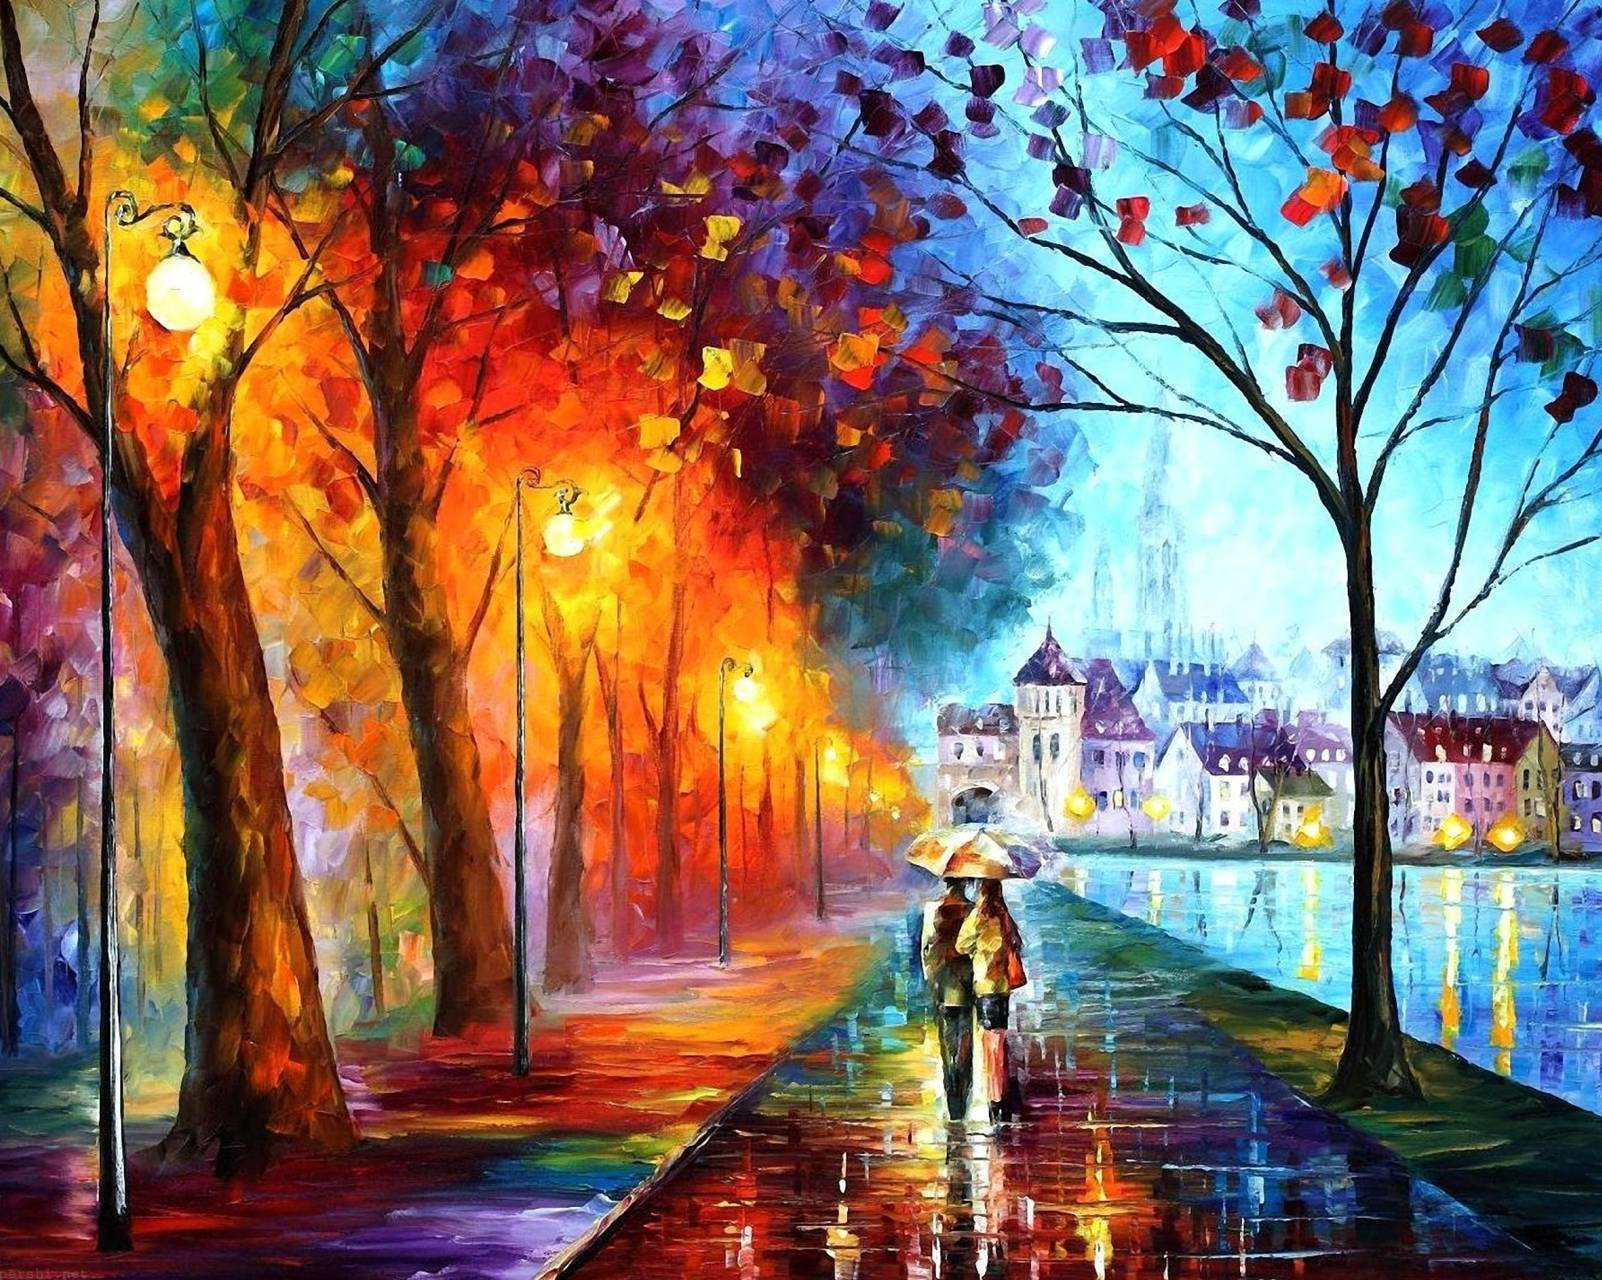 Love Paintwork Wallpaper by Samantha80 - 15